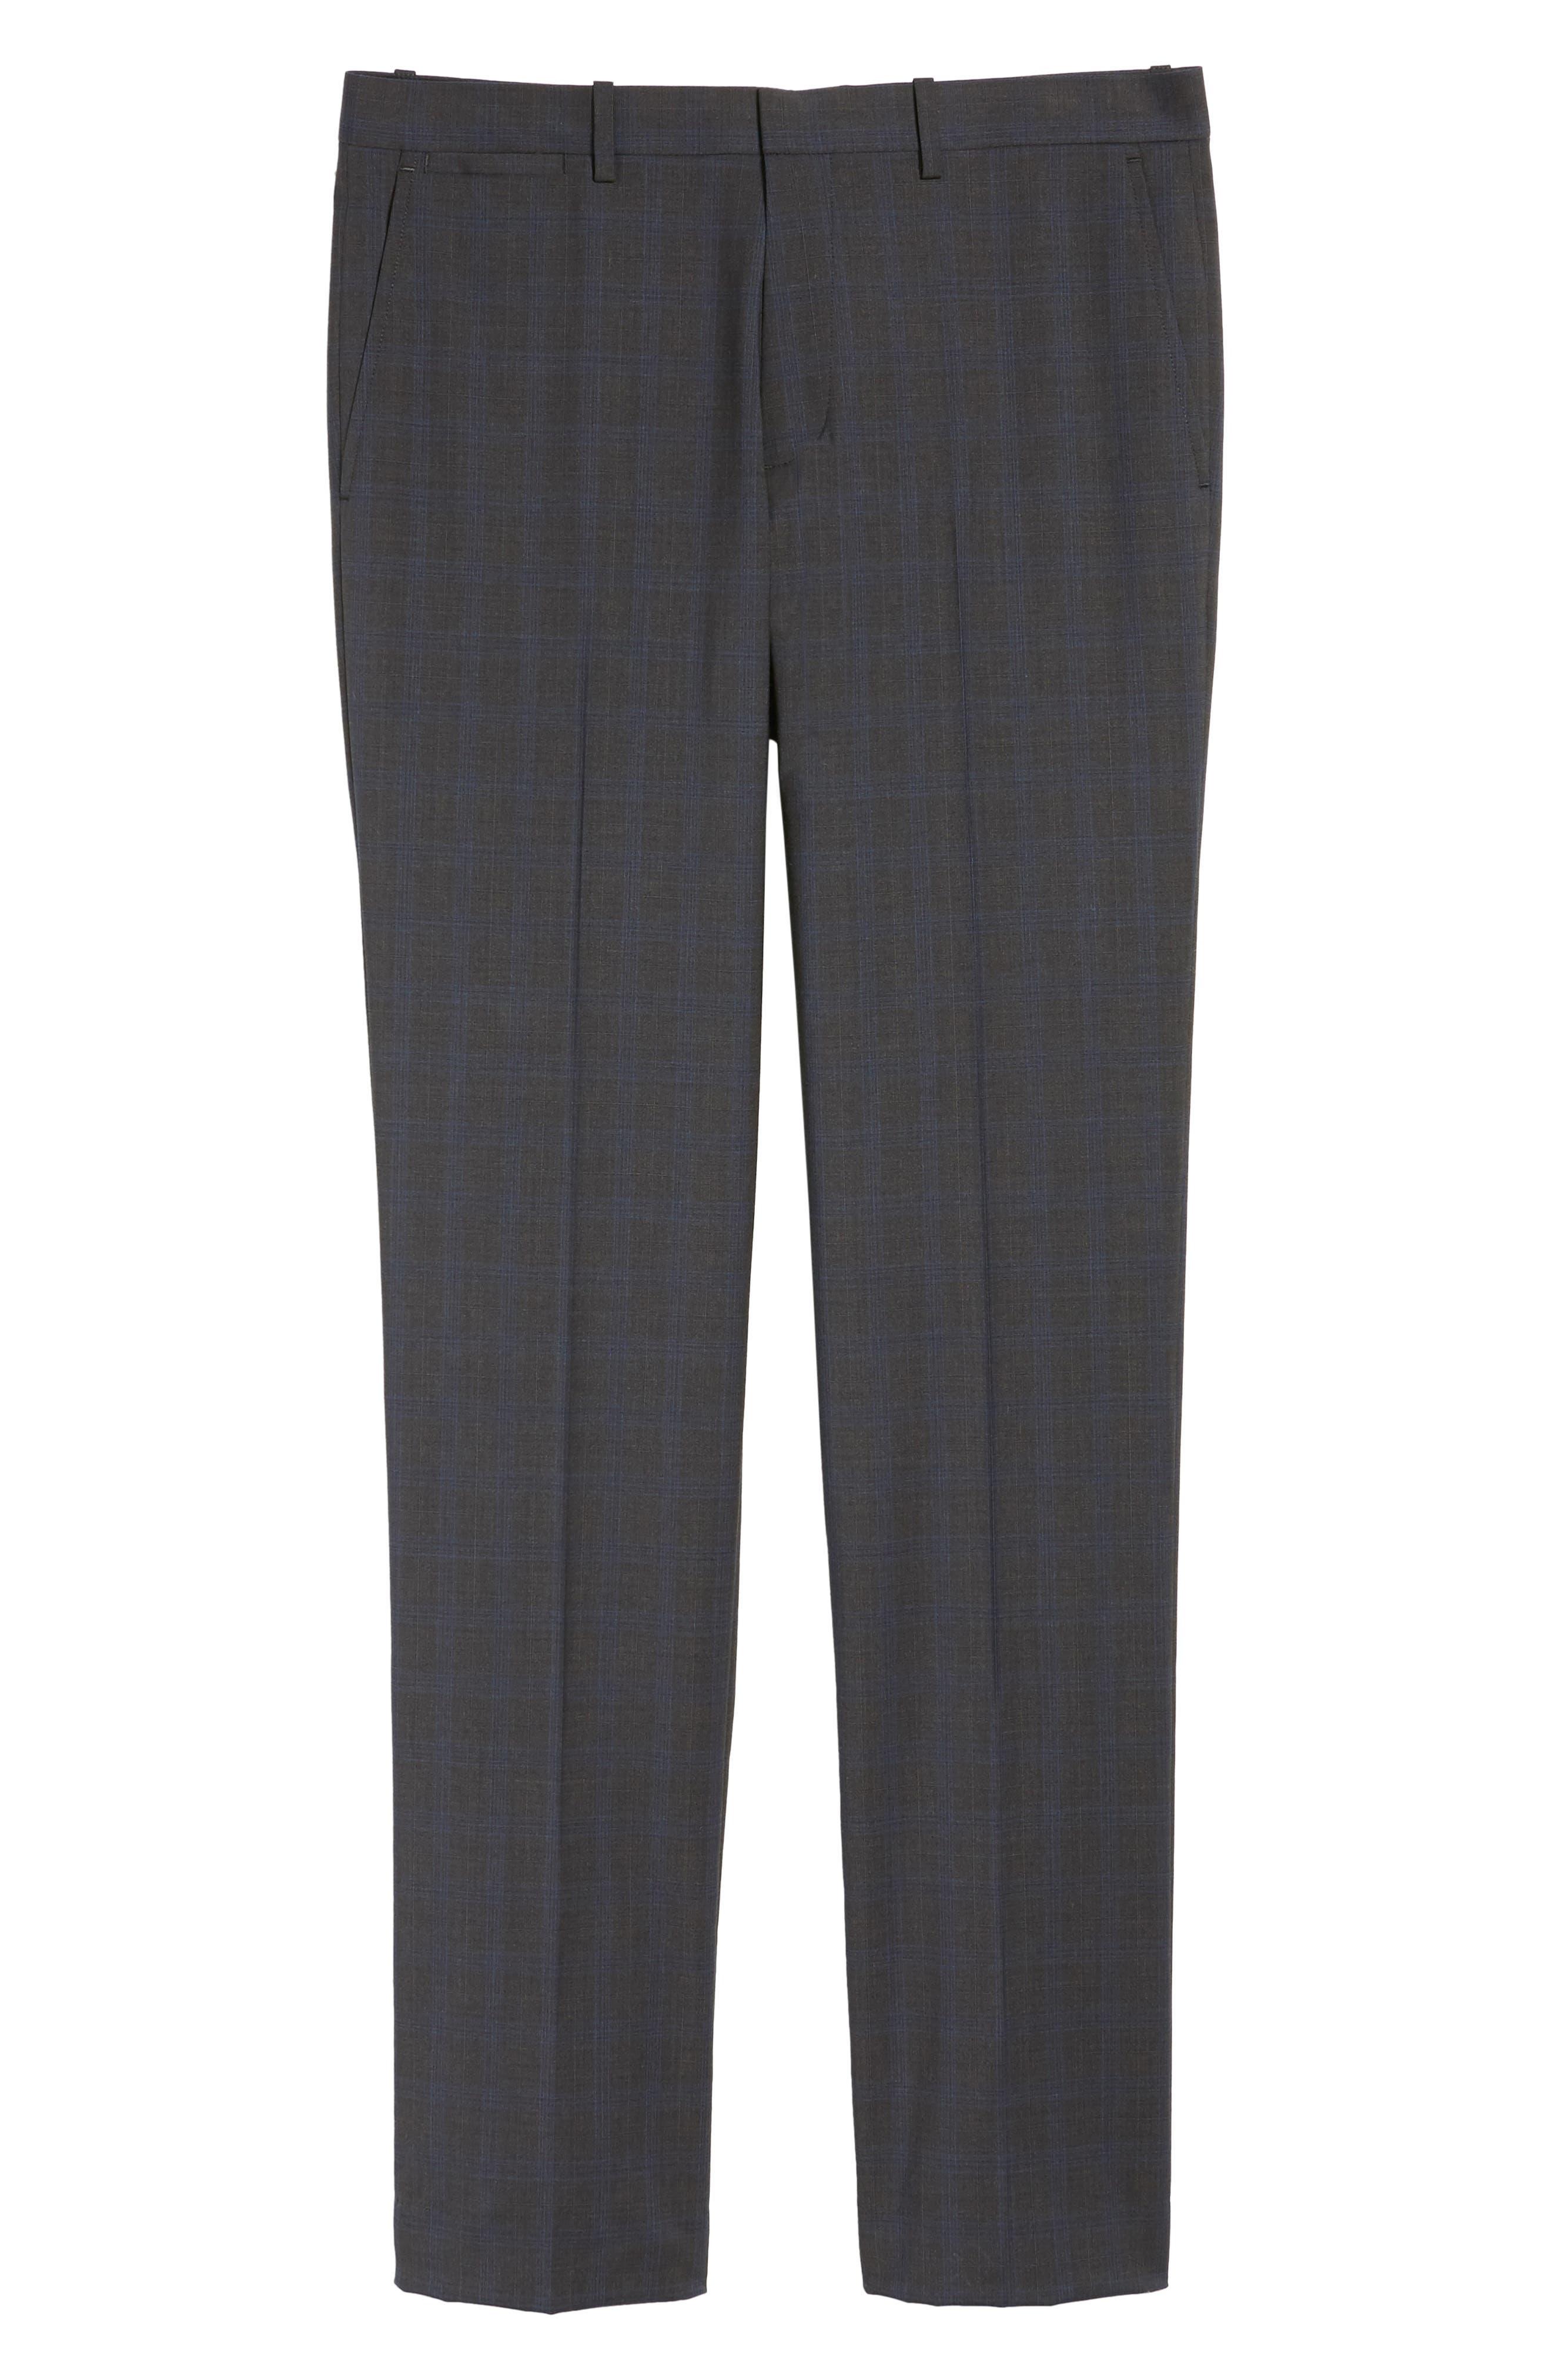 Marlo Trim Fit Tonal Plaid Trousers,                             Alternate thumbnail 6, color,                             053